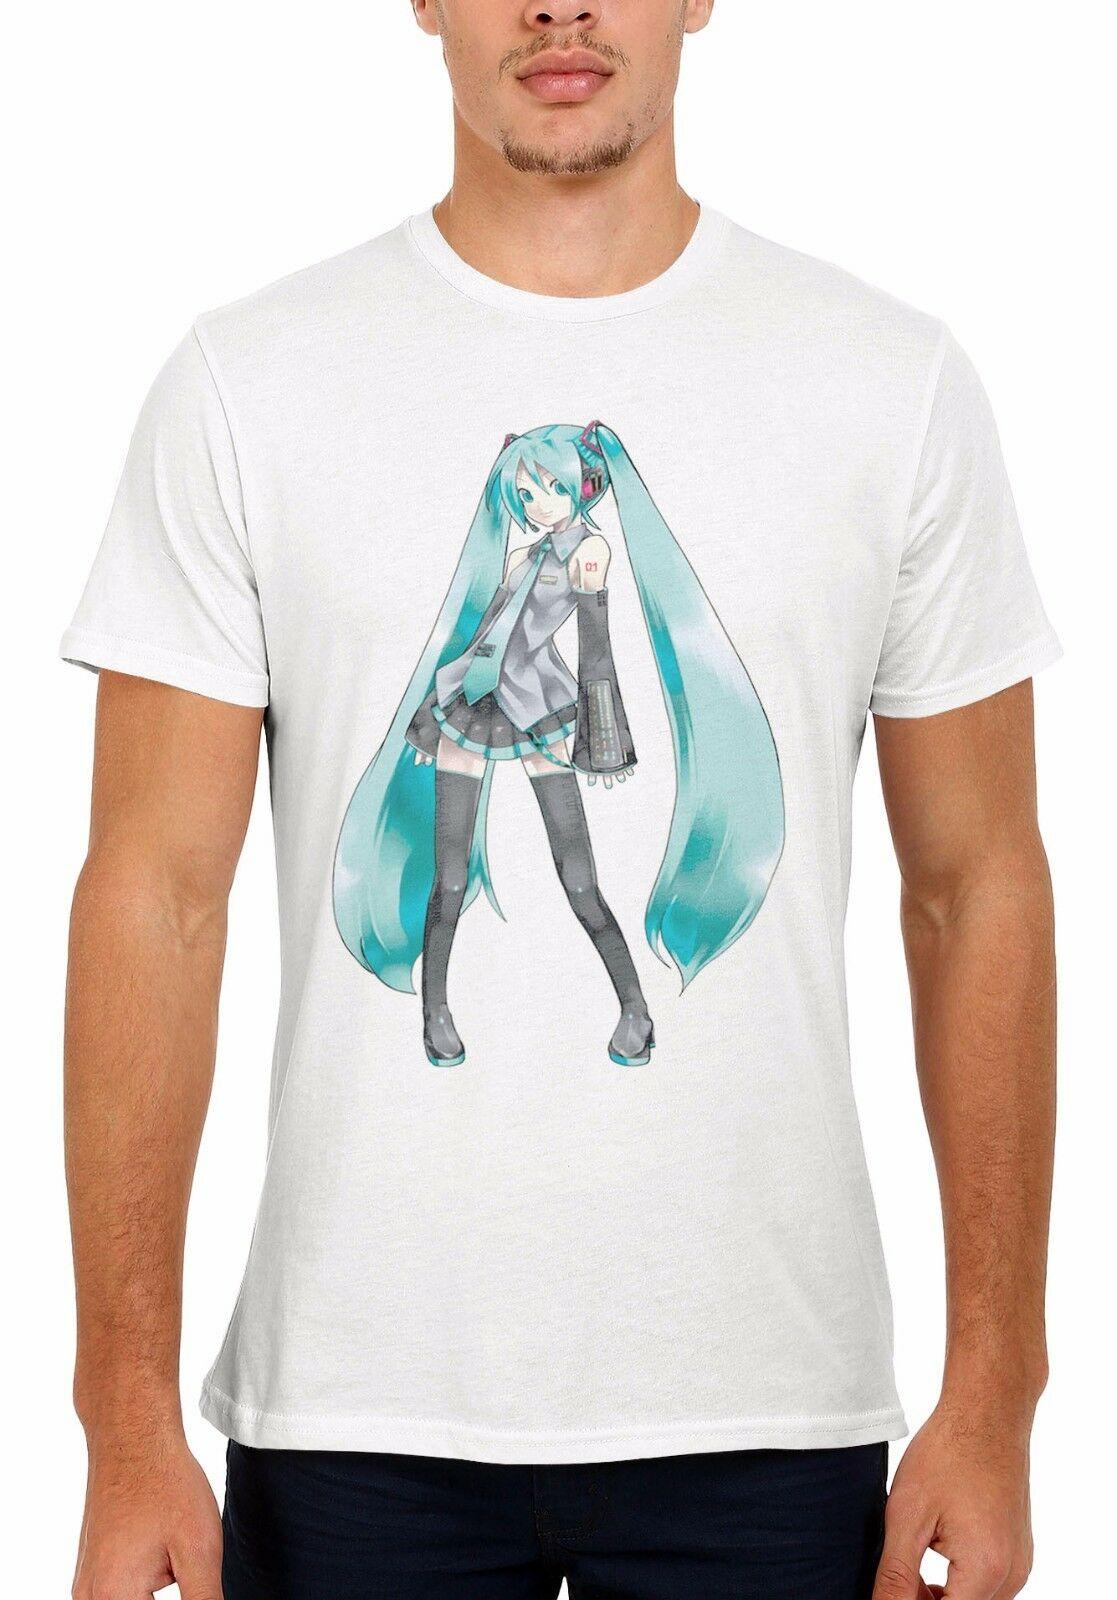 Hatsune Miku Violet Manga Anime Cool Men Women Vest  Unisex T Shirt 151ECartoon t shirt men Unisex New Fashion tshirt